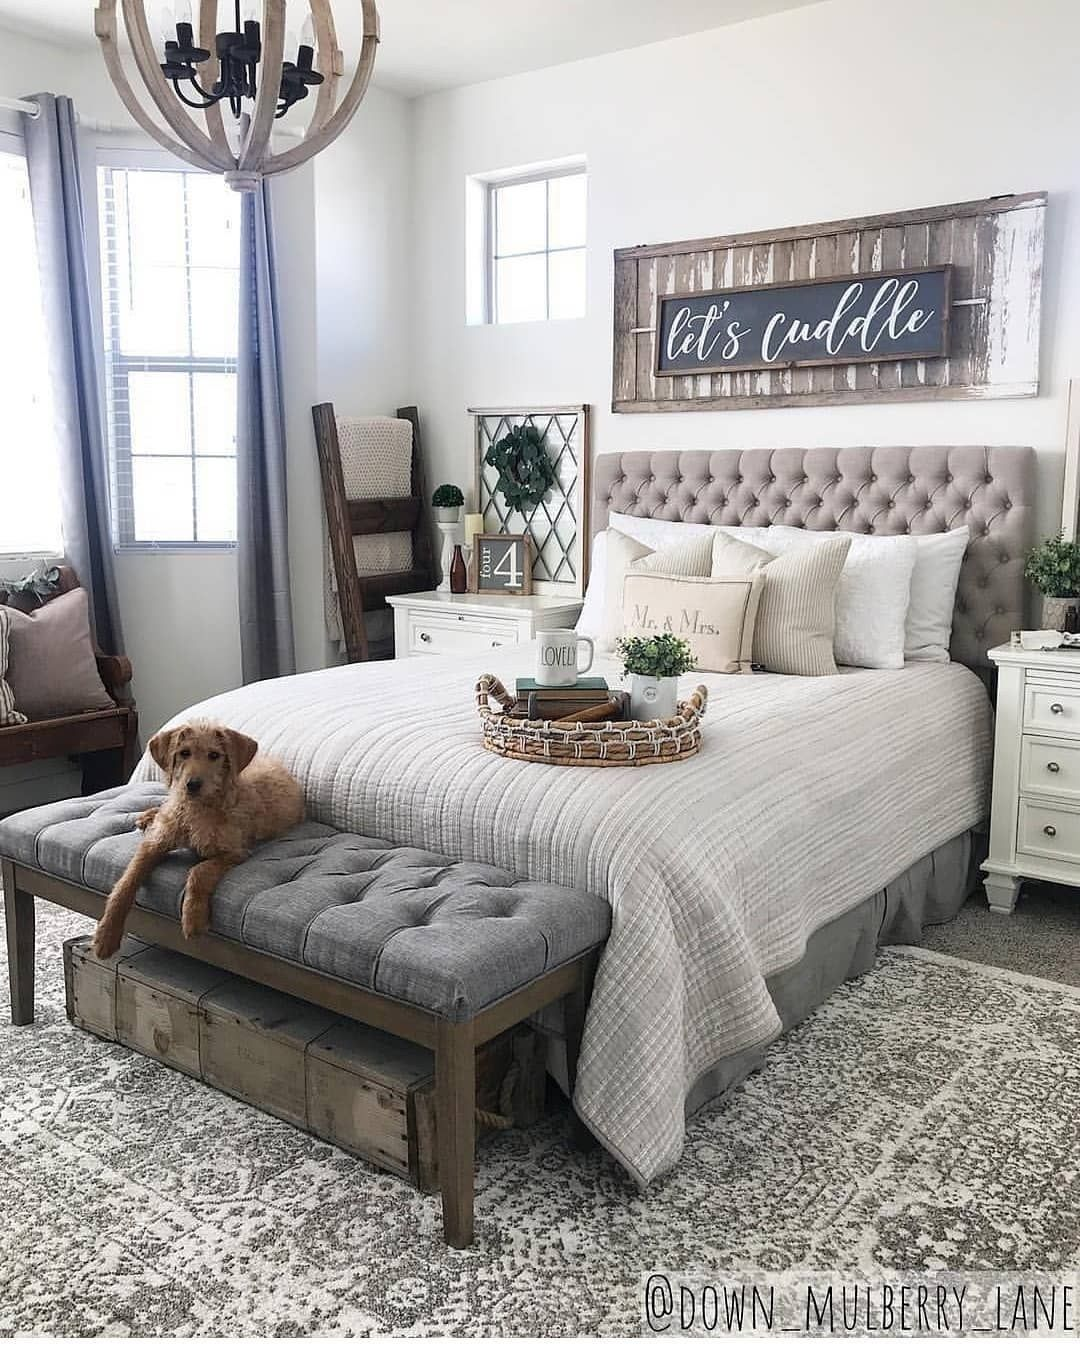 42 Farmhouse Rustic Master Bedroom Ideas Abchomy Farmhouse Bedroom Decor Remodel Bedroom Master Bedrooms Decor